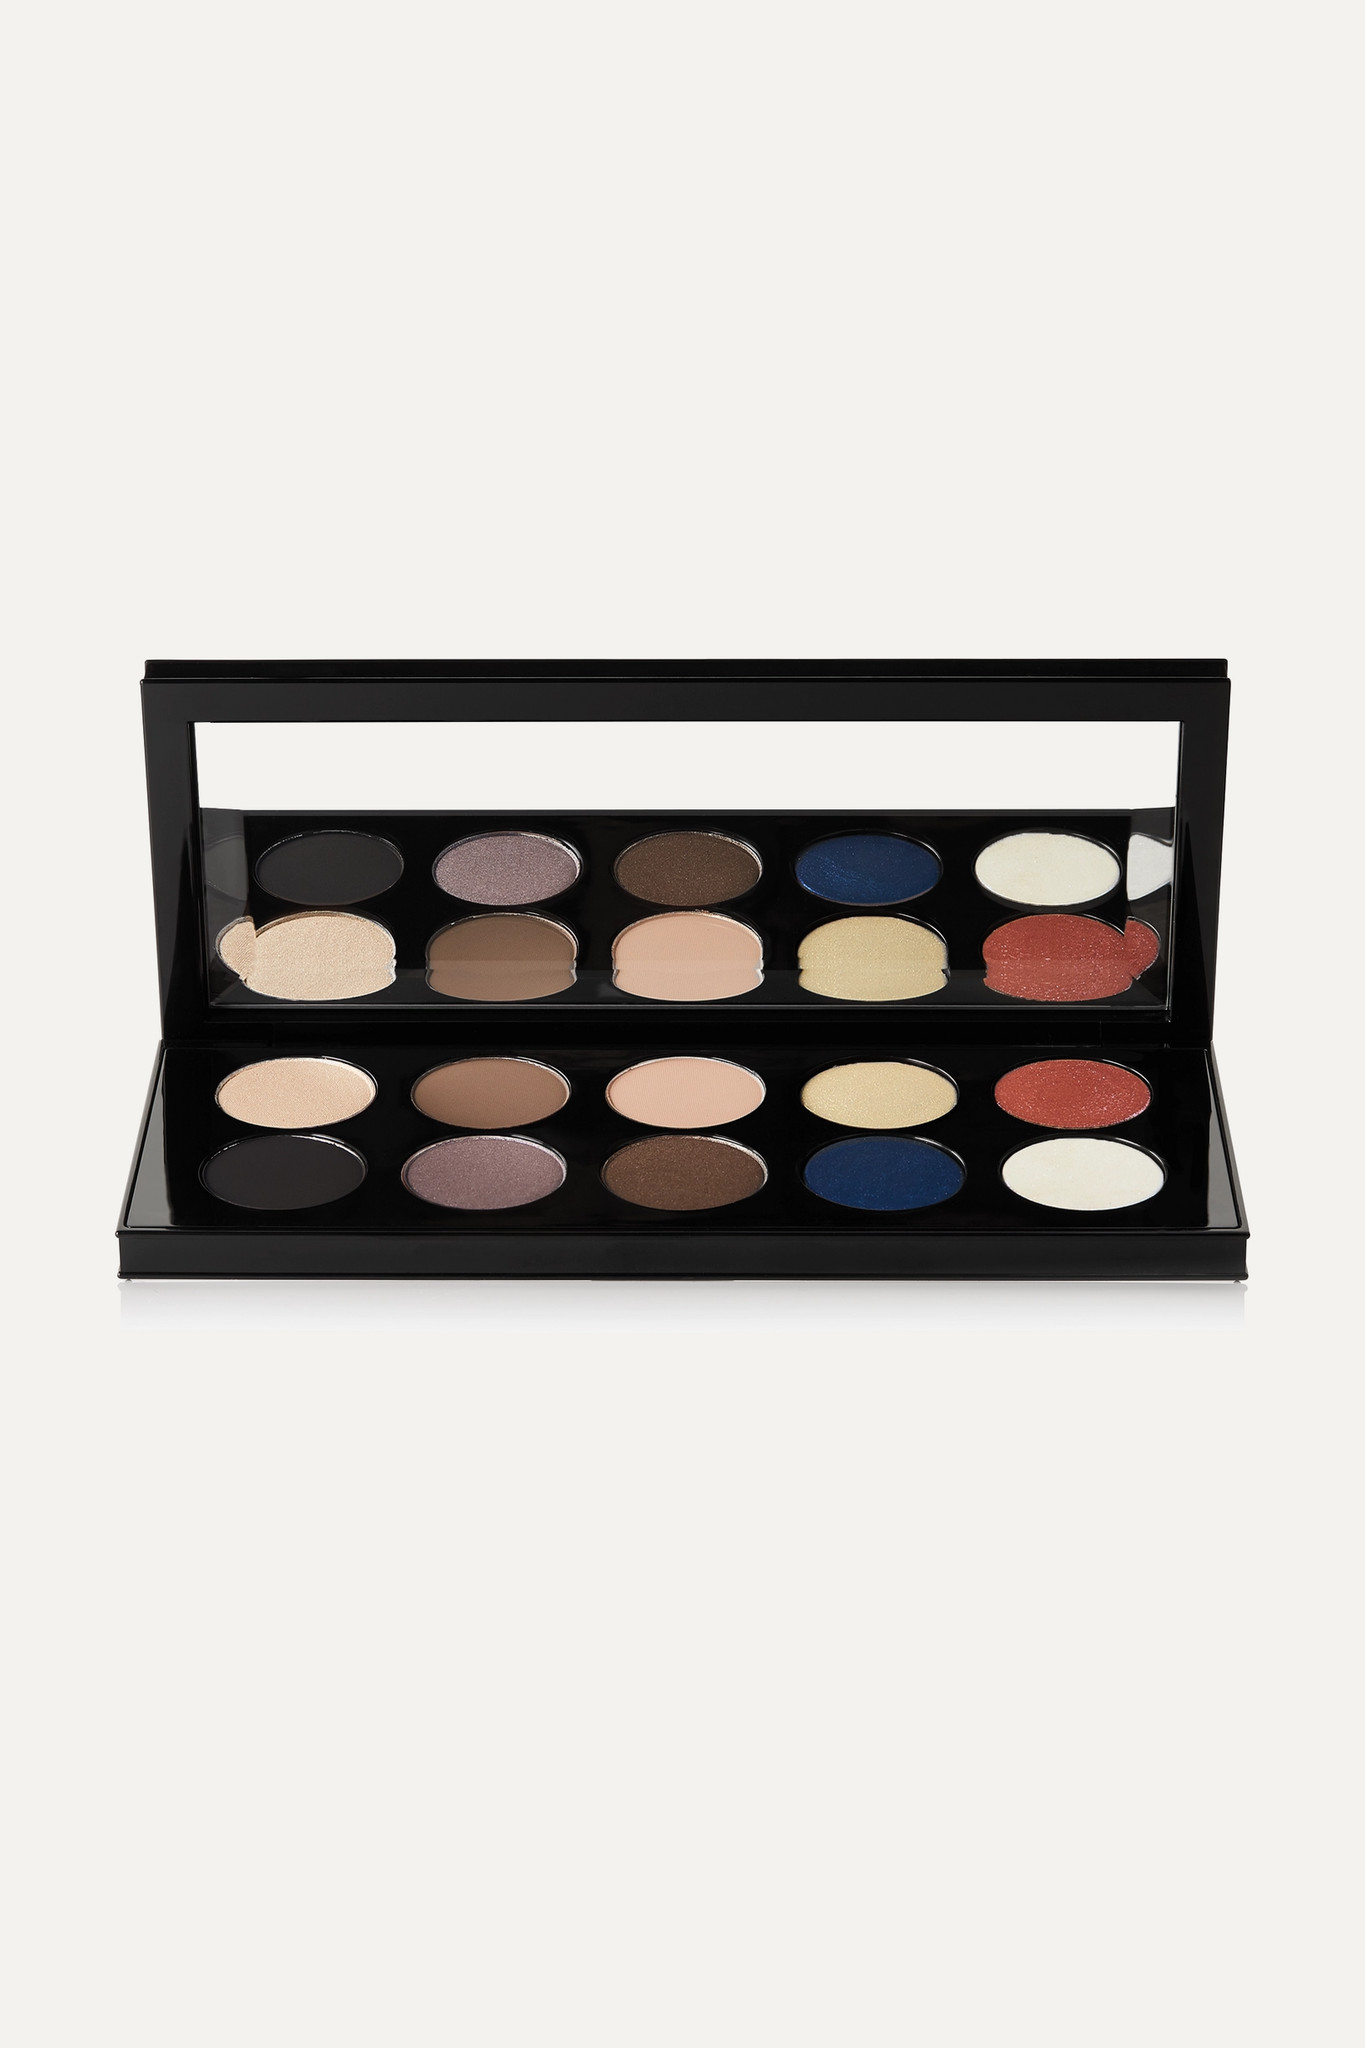 PAT MCGRATH LABS - Mothership I Eyeshadow Palette - Subliminal - Neutrals - one size